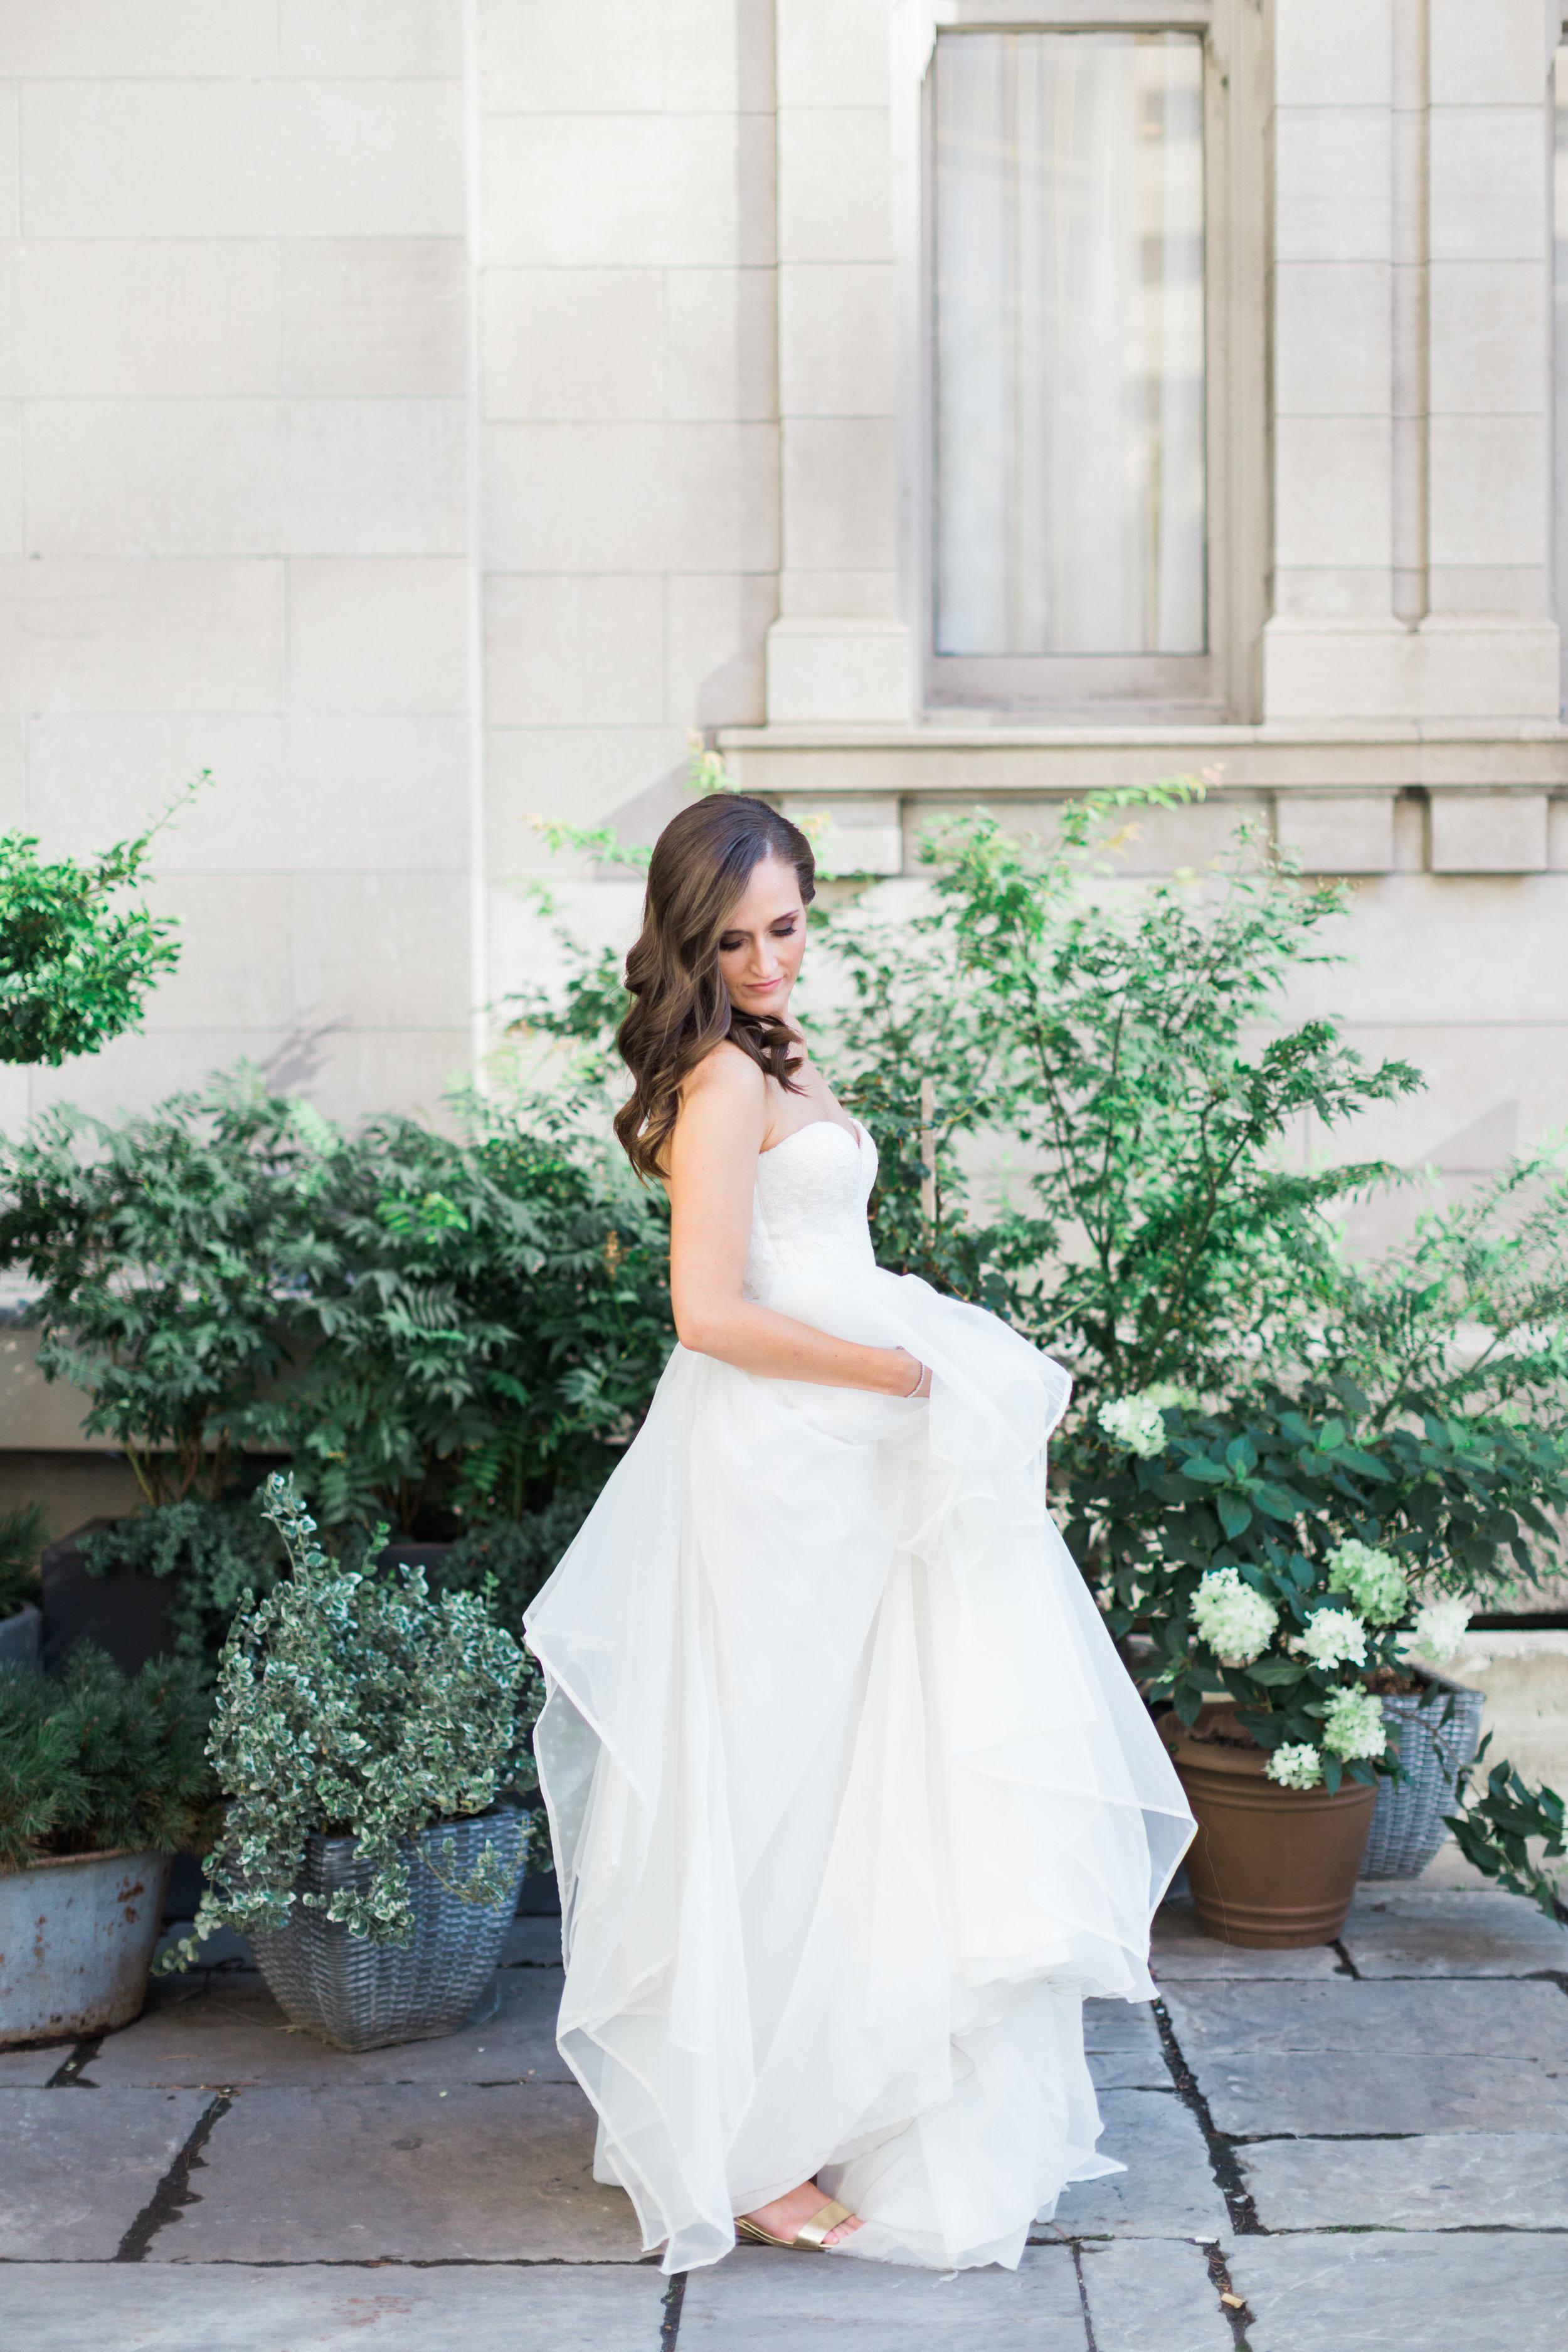 Toronto Fine Art Photographer - Yorkville Wedding - Bride & Groom Portraits-72.jpg